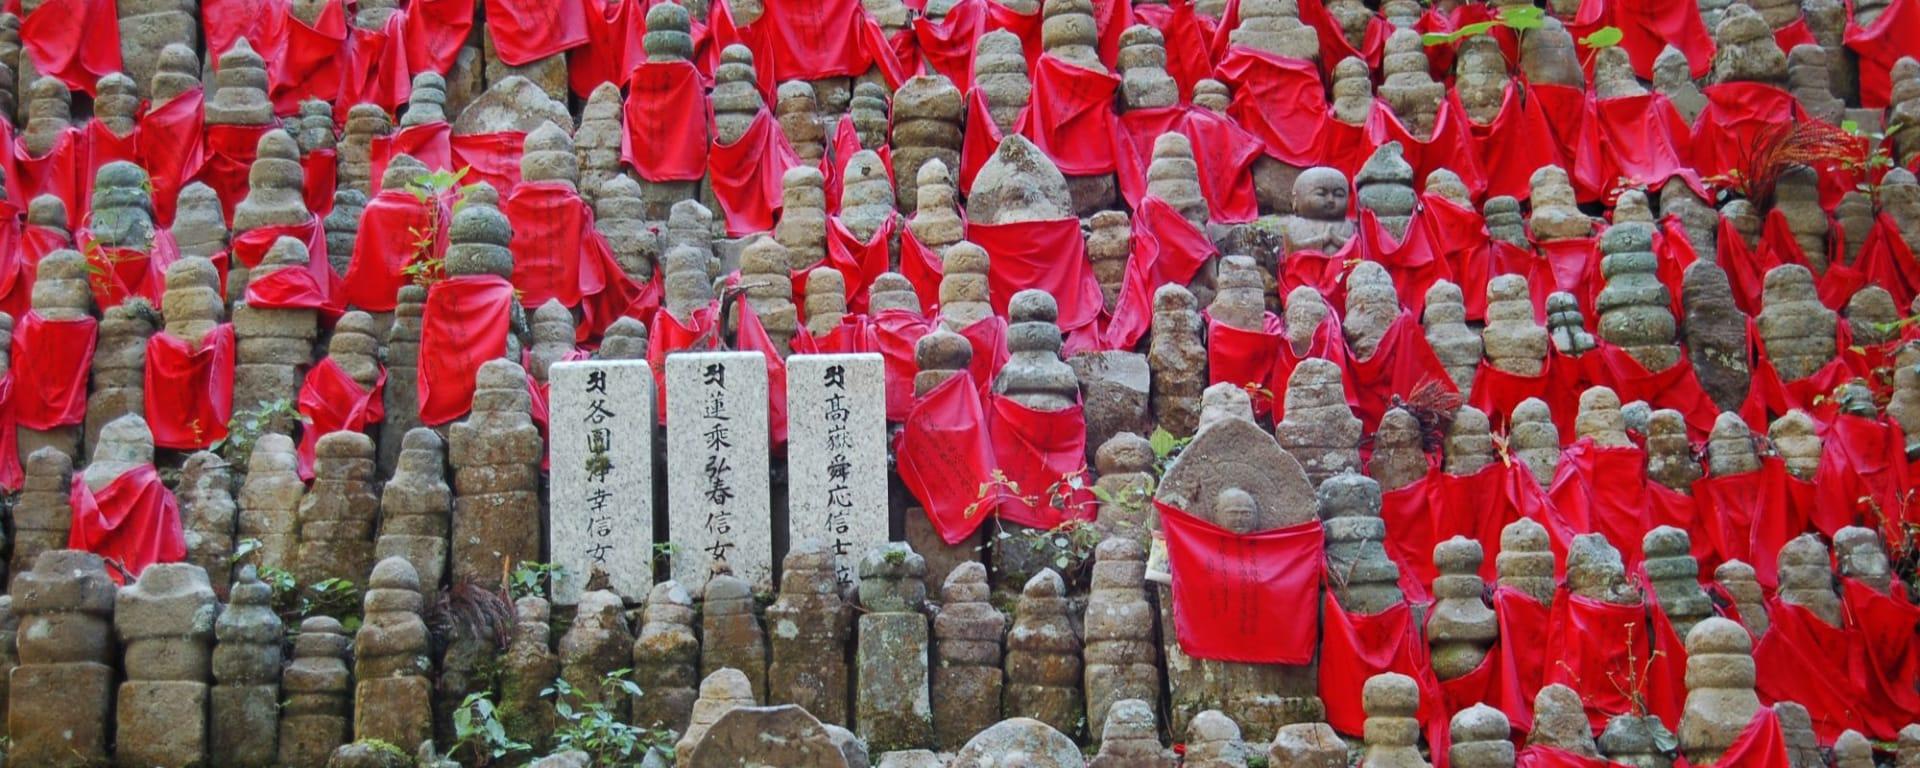 Weltkulturerbe Mt. Koya in Osaka: Hundreds of buddha statues in Okunoin Cemetery, Koyasan